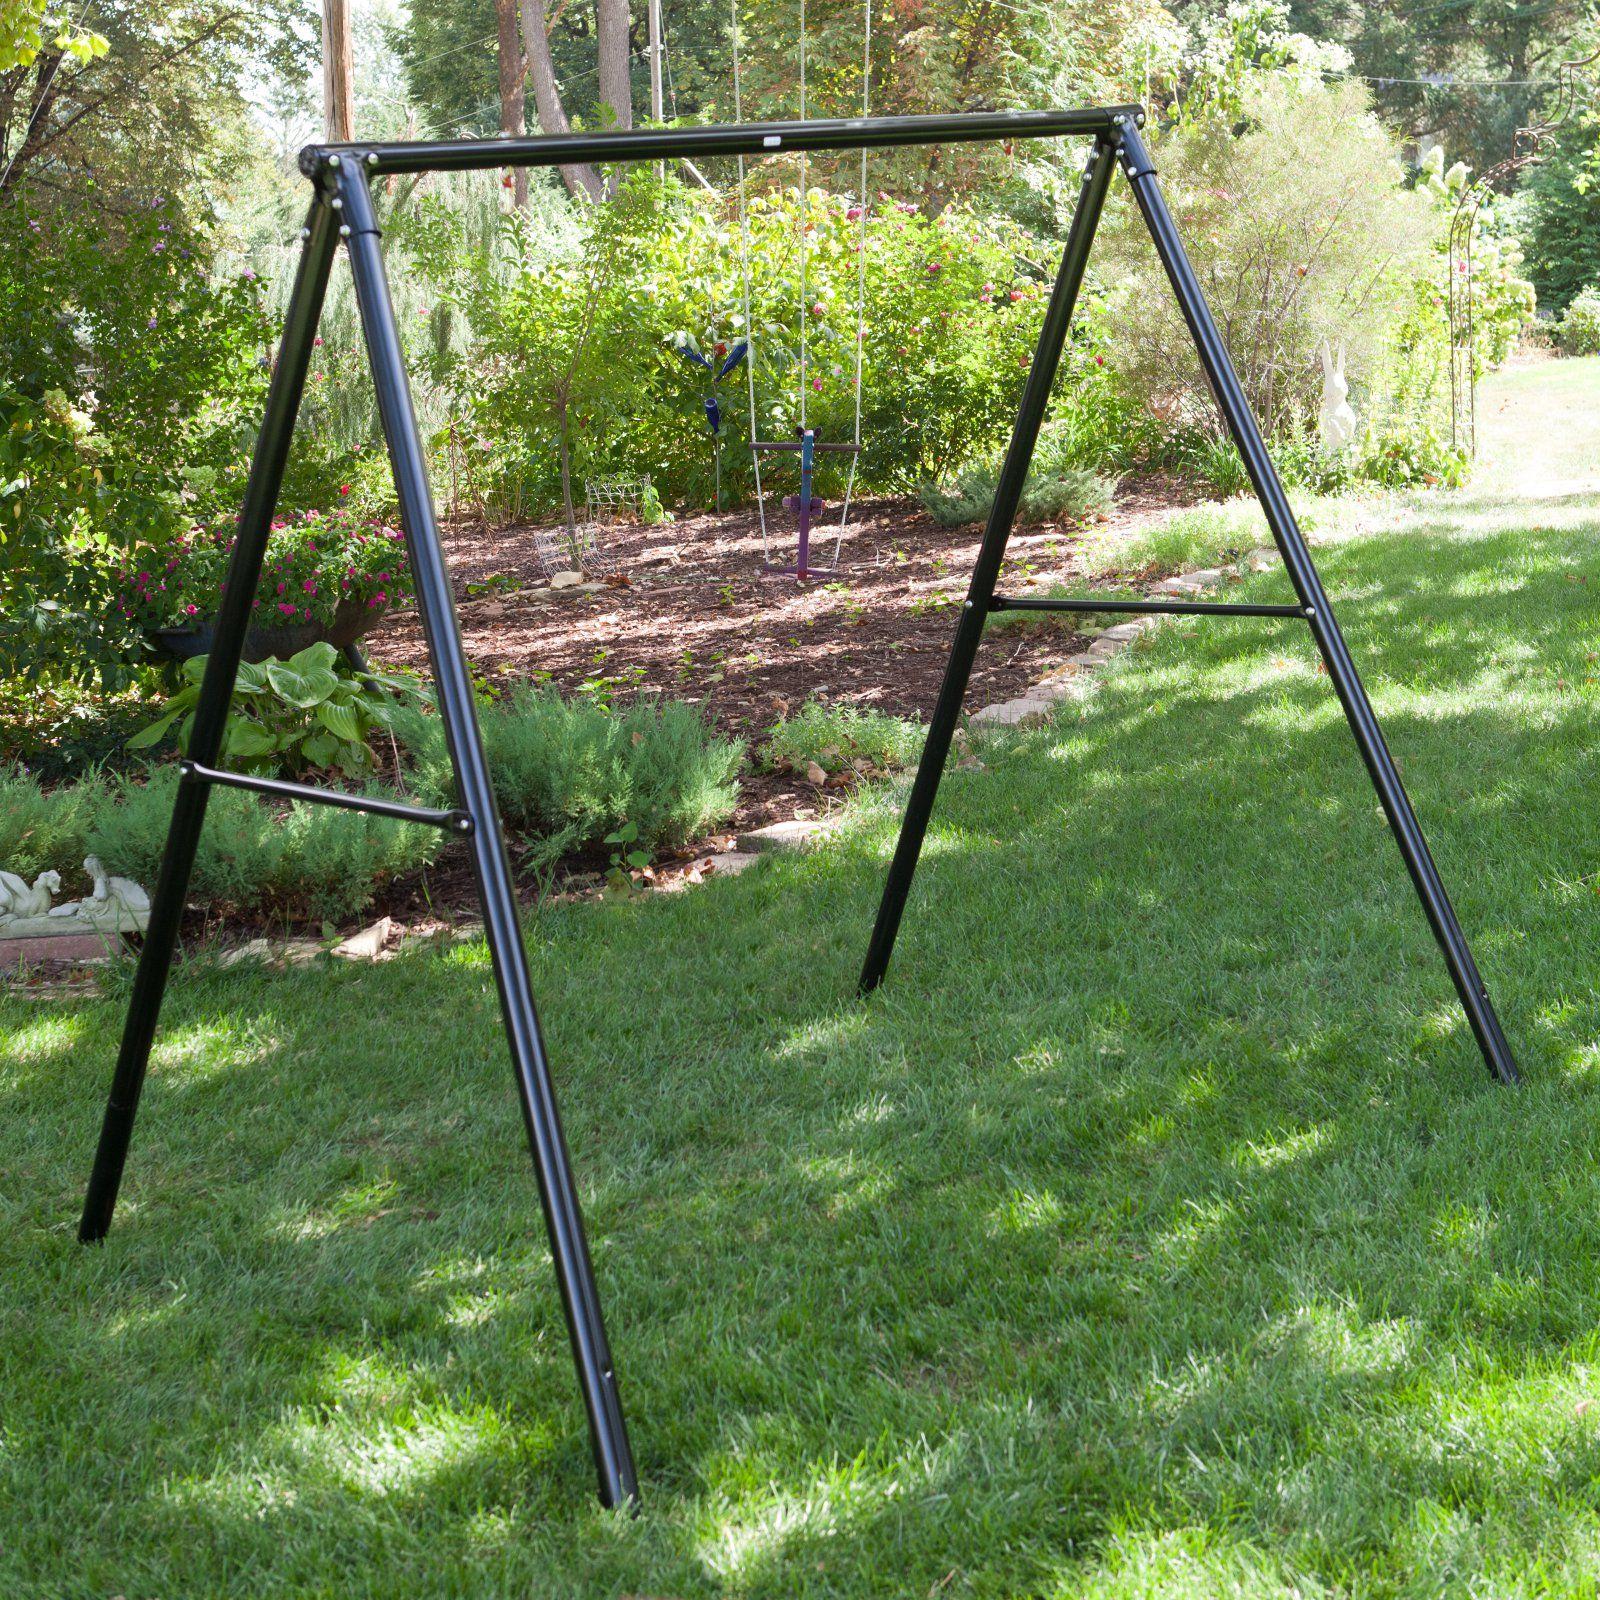 Patio Swing Set Flexible Flyer Lawn Swing Frame In 2019 Products